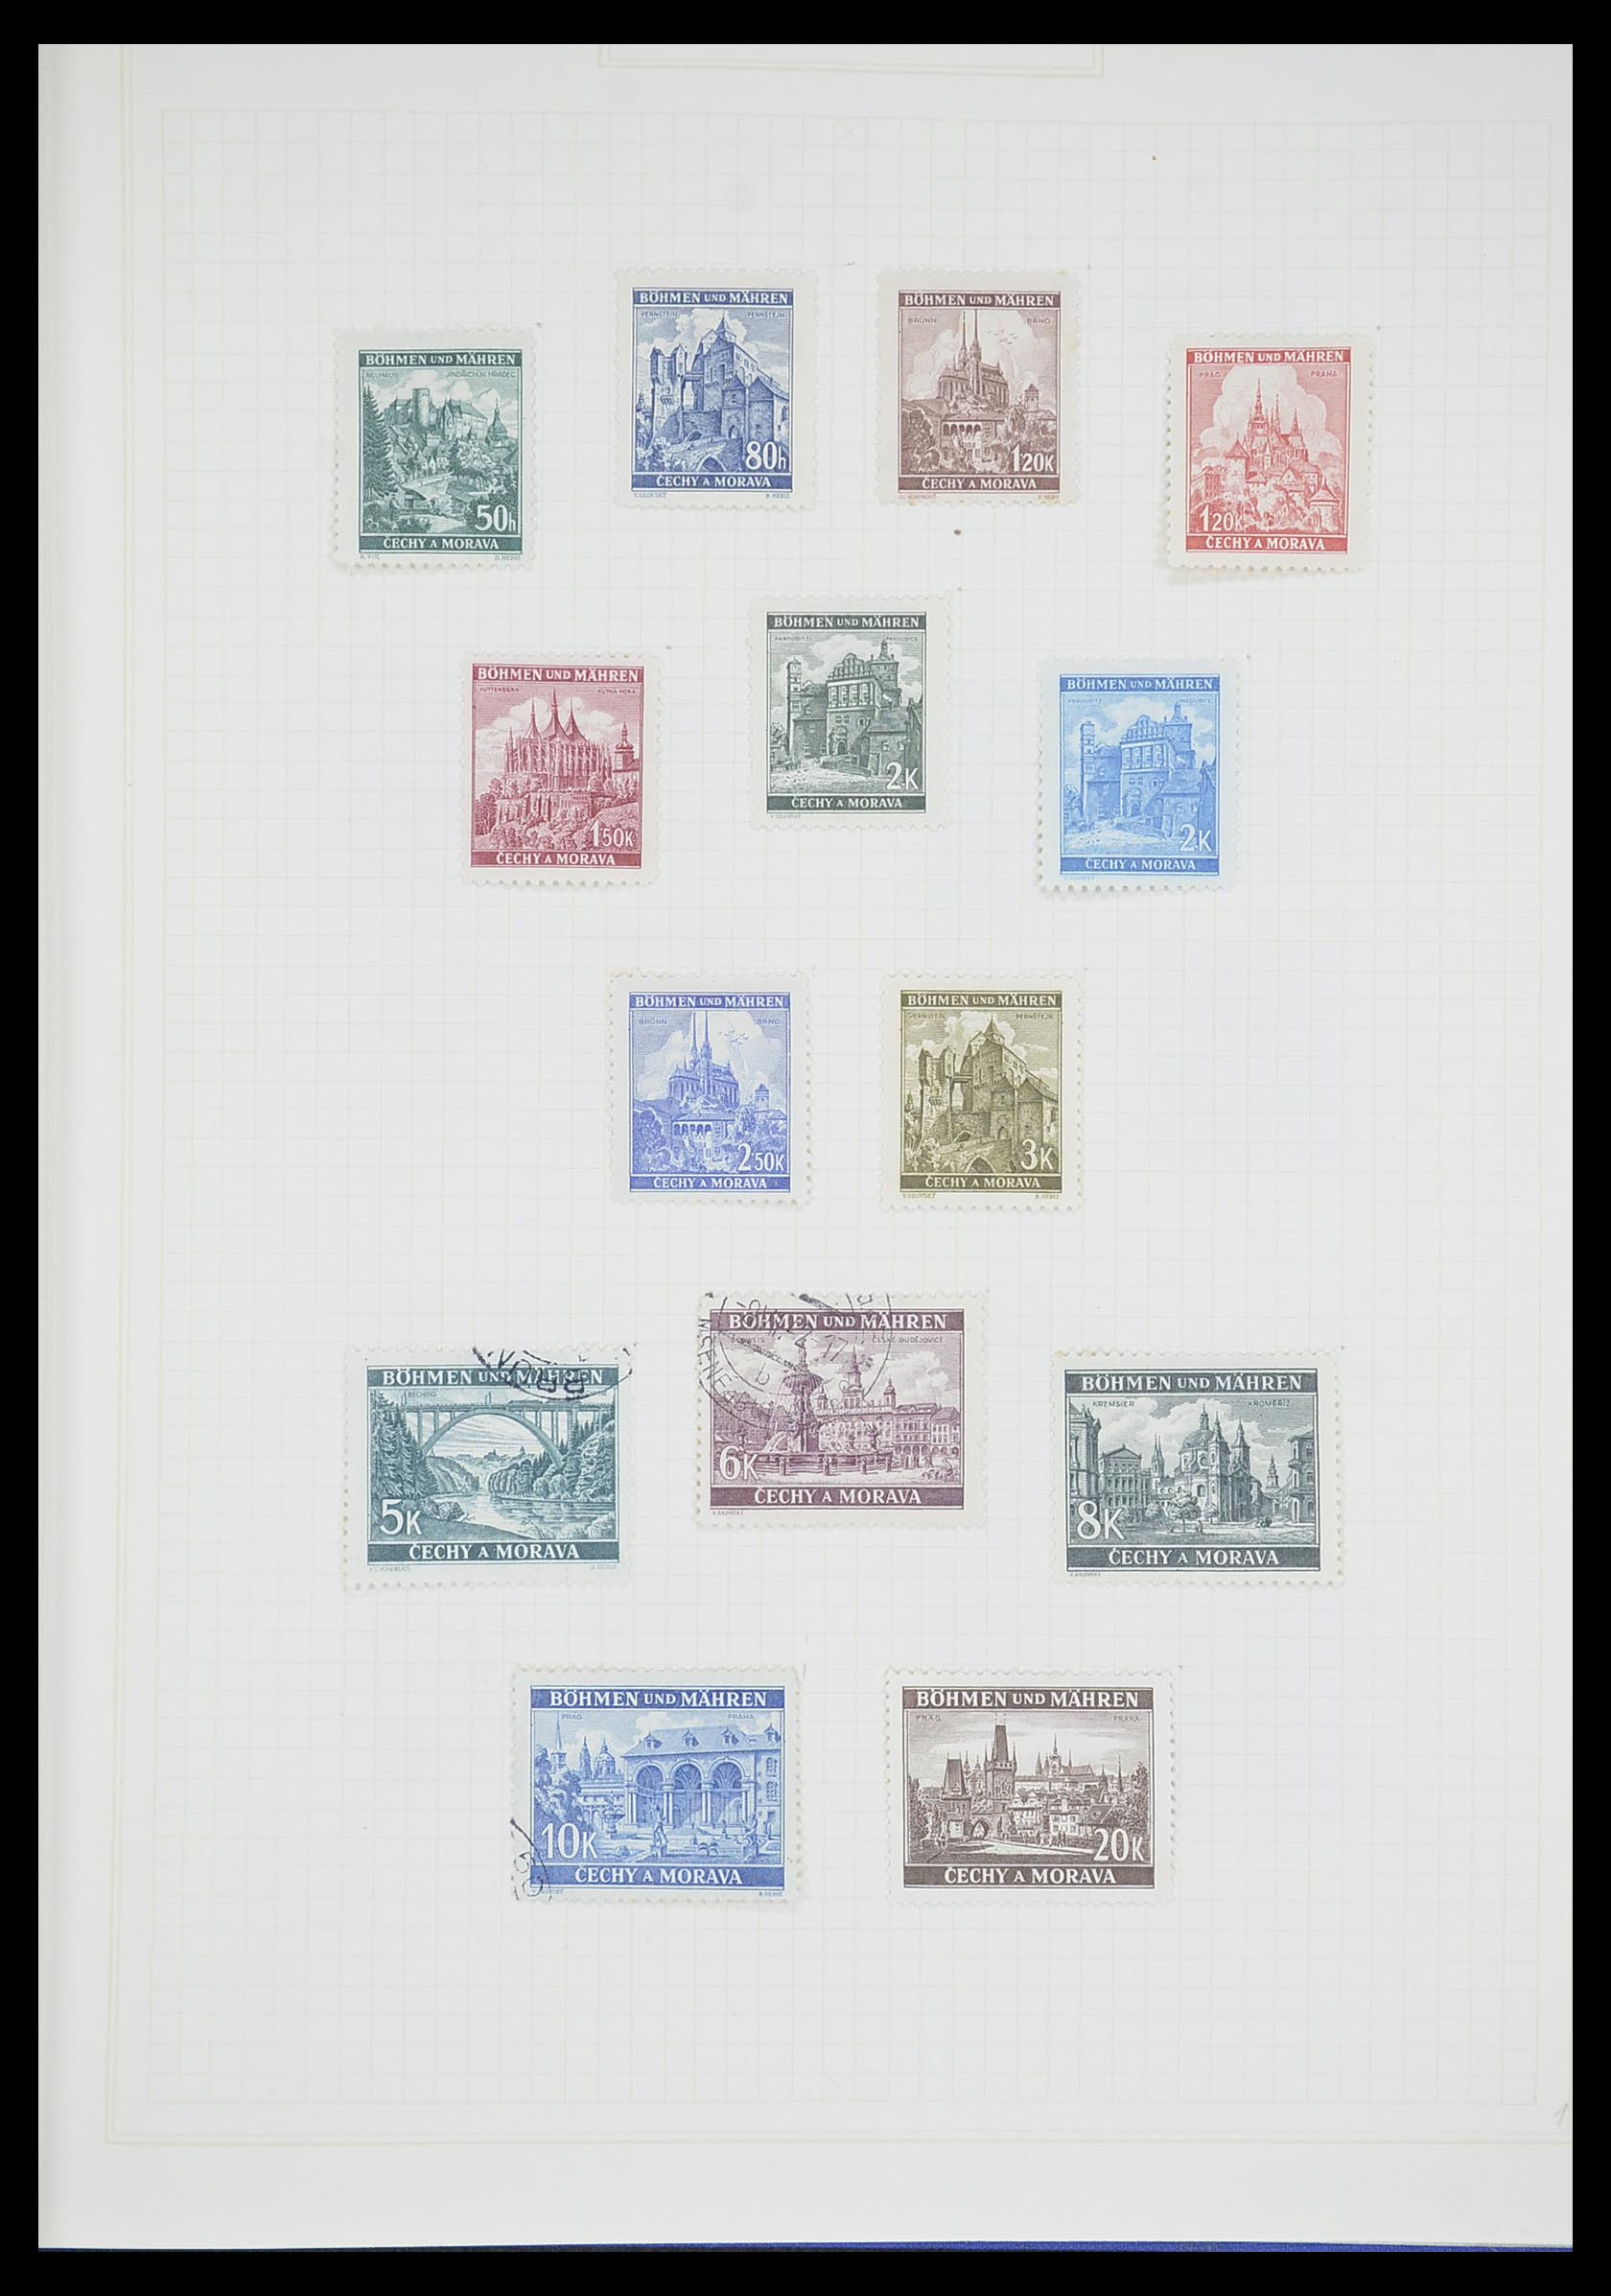 33713 015 - Postzegelverzameling 33713 Duitse bezettingen WO I en WO II 1914-1945